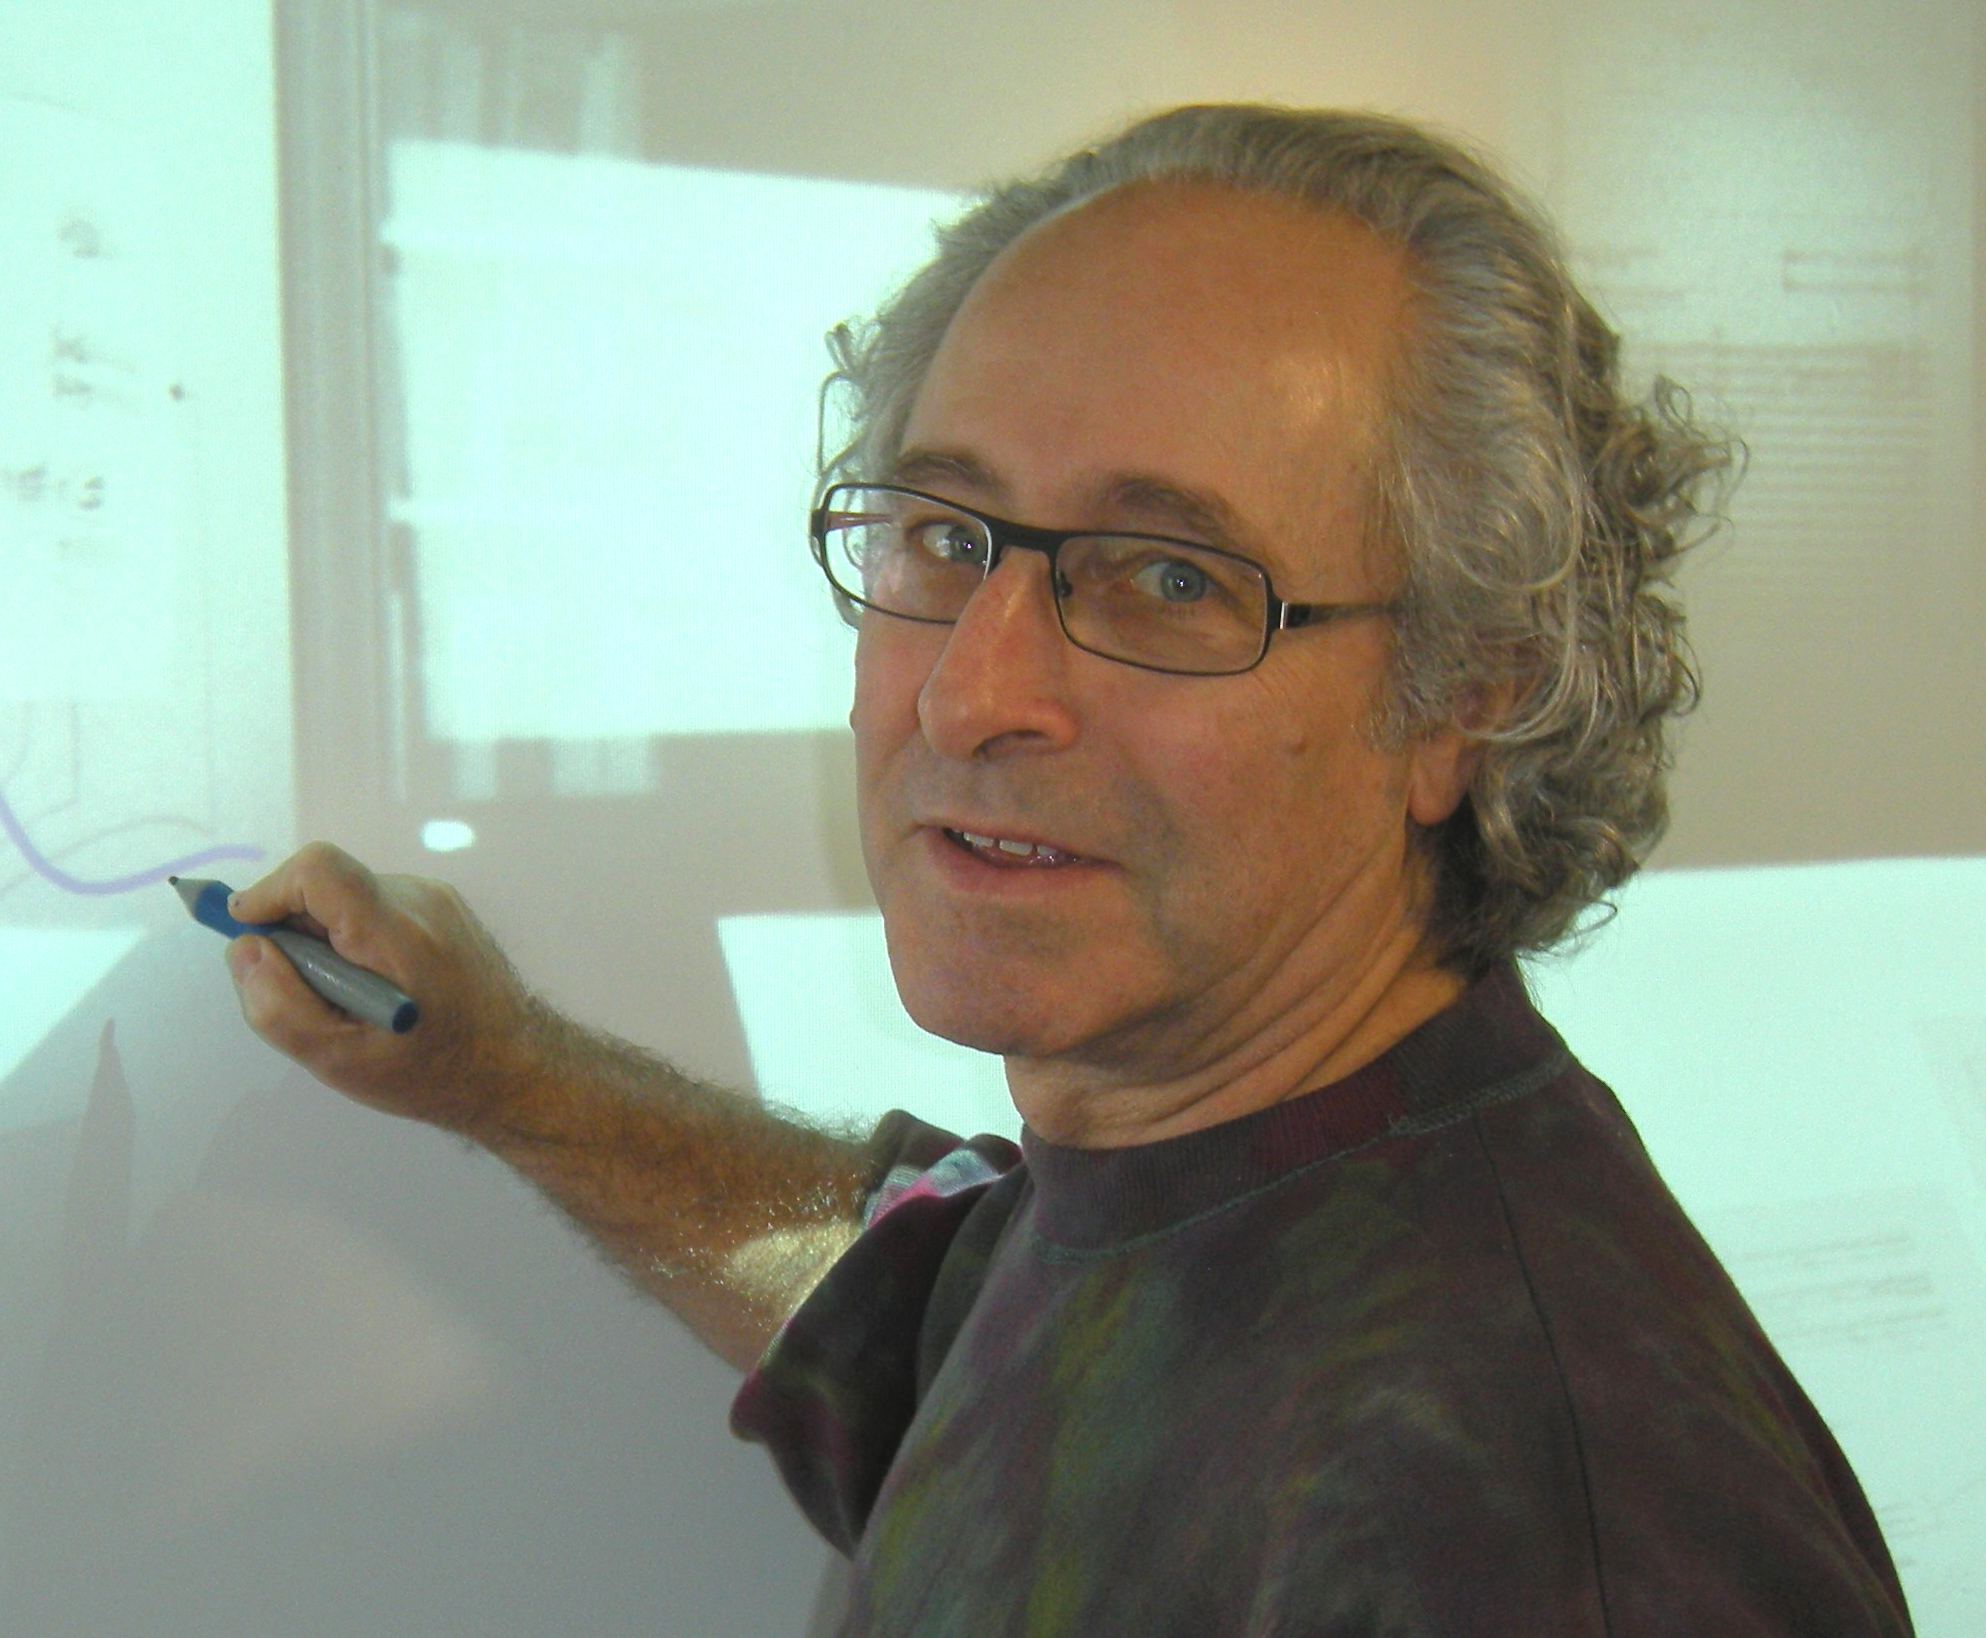 Craig Harris, Creator of Multimedia Performances in Minneapolis, MN